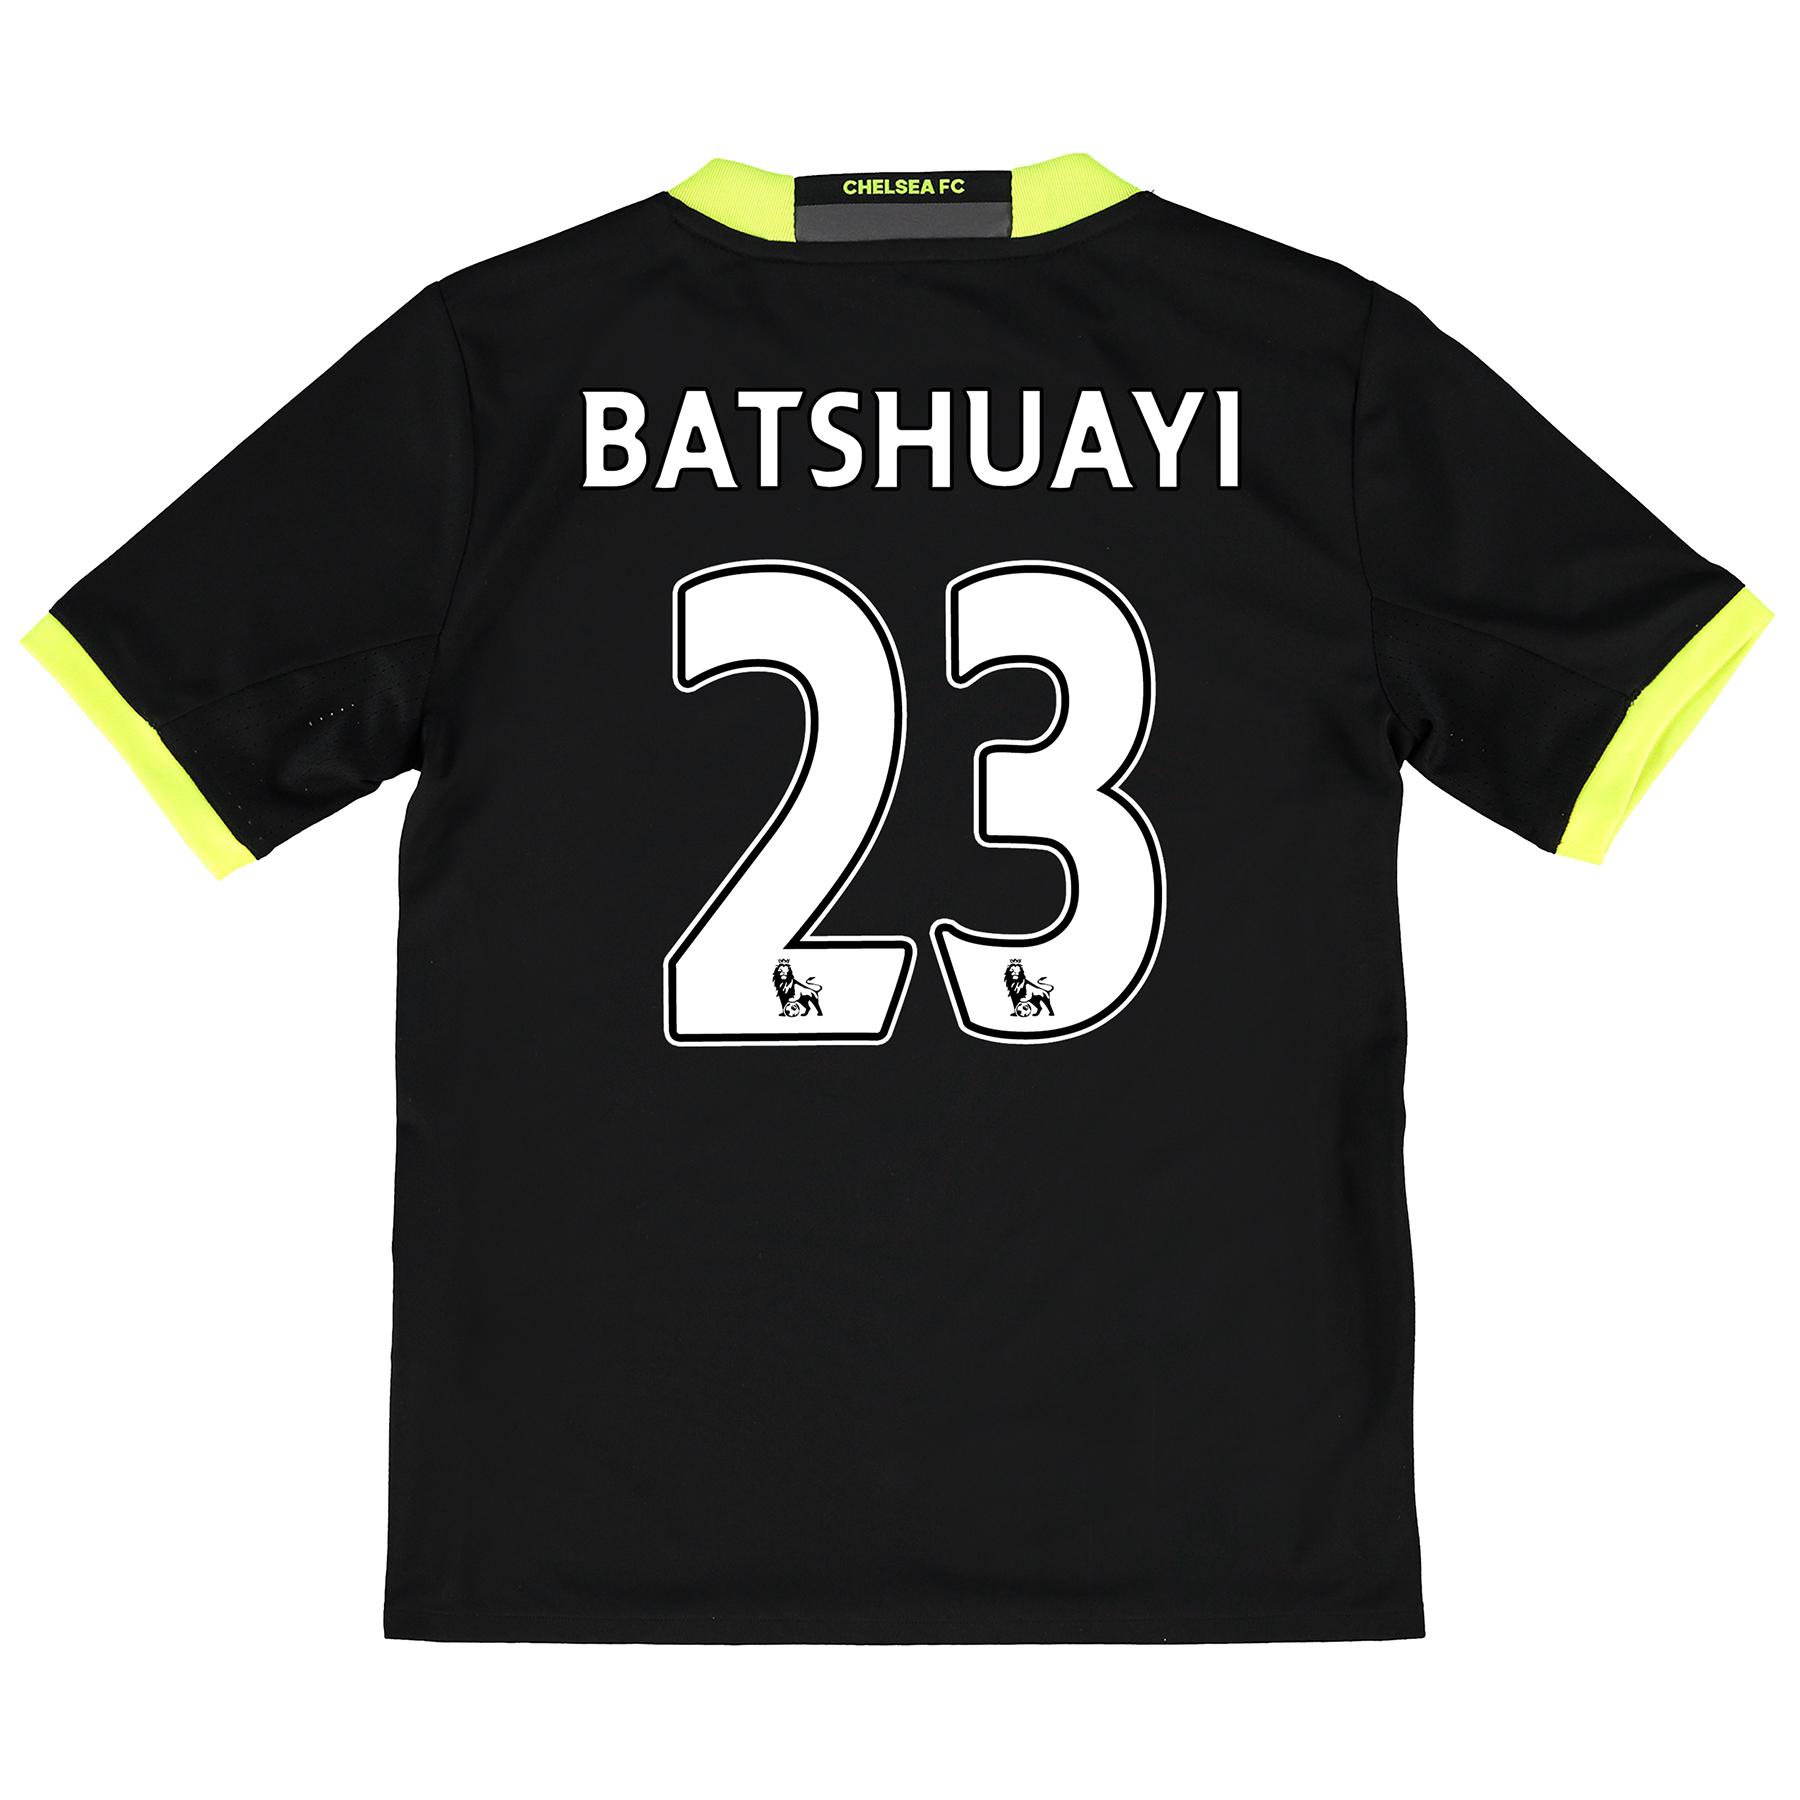 Chelsea Away Baby Kit 16-17 with Batshuayi 23 printing